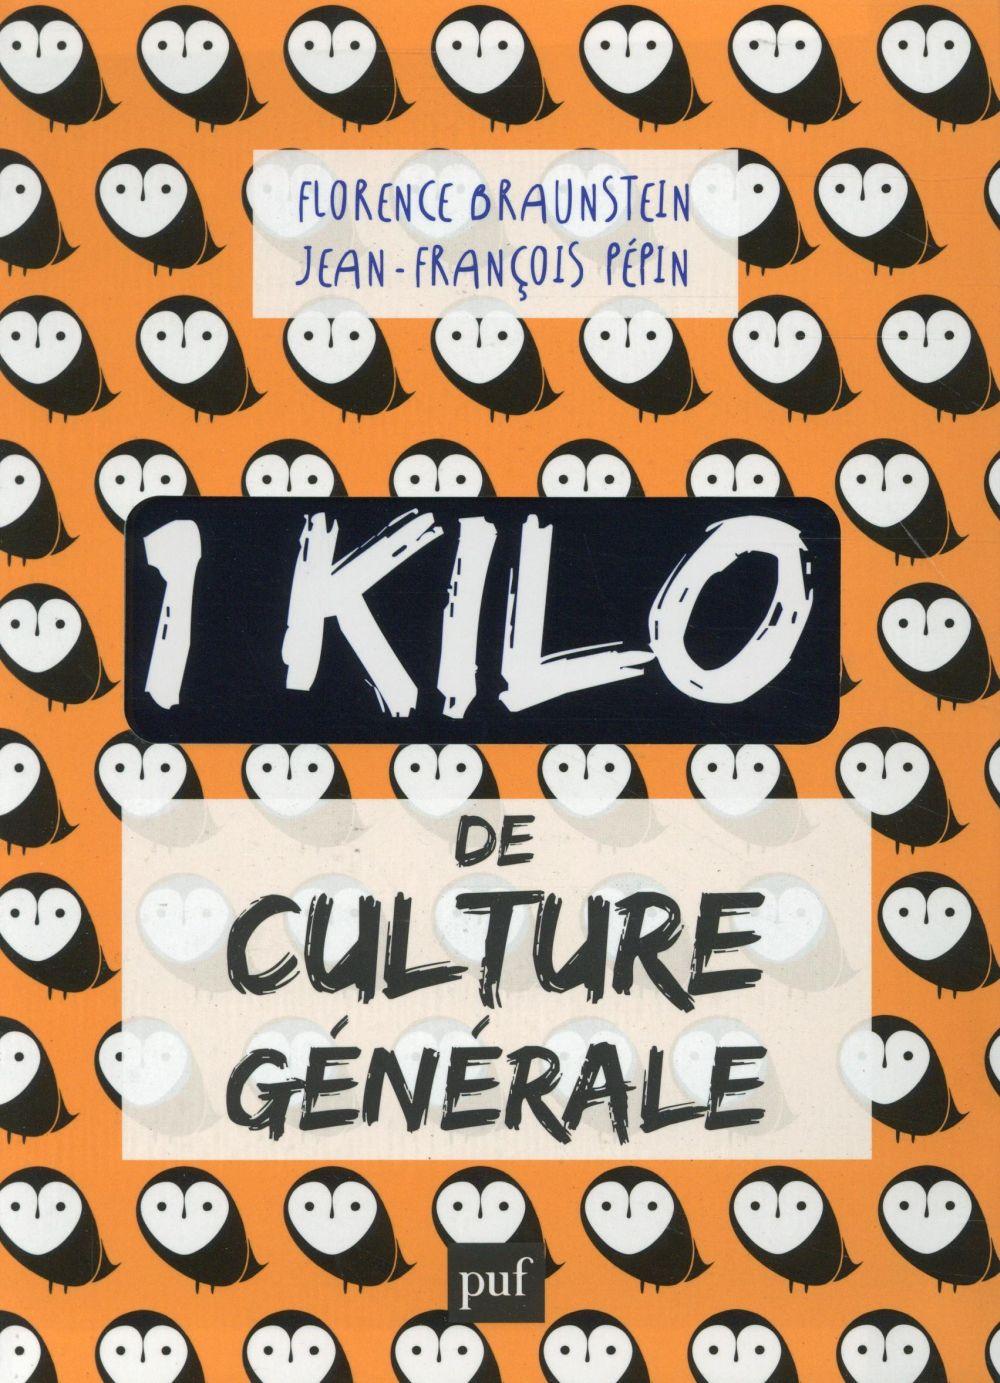 1 KILO DE CULTURE GENERALE  -  COLLECTOR BRAUNSTEIN/PEPIN PUF